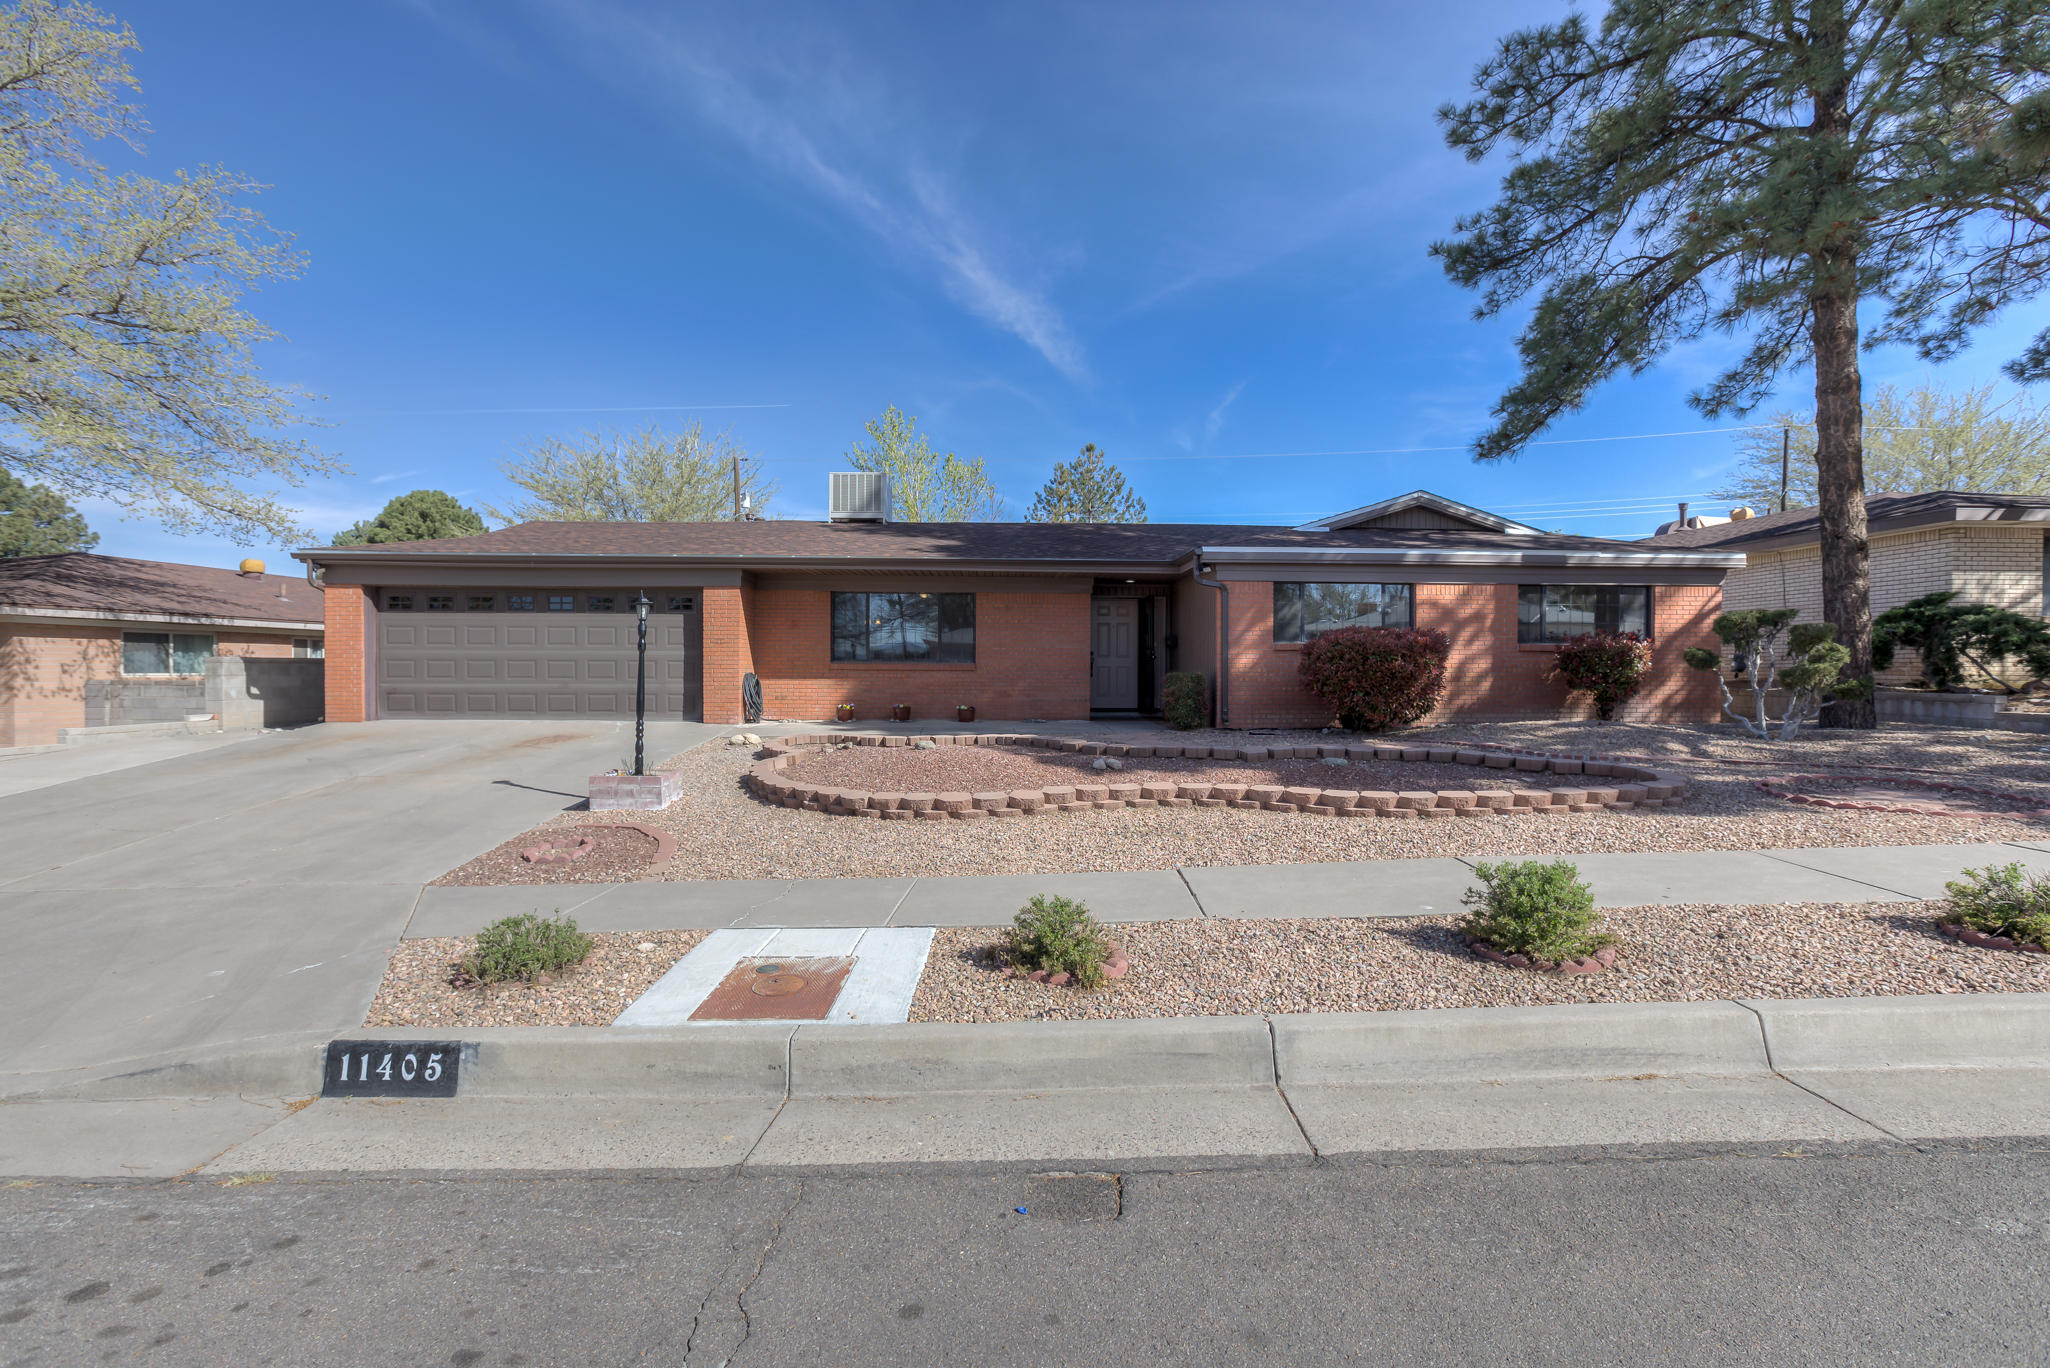 11405 NE Golden Gate Avenue, Albuquerque Northeast Heights, New Mexico